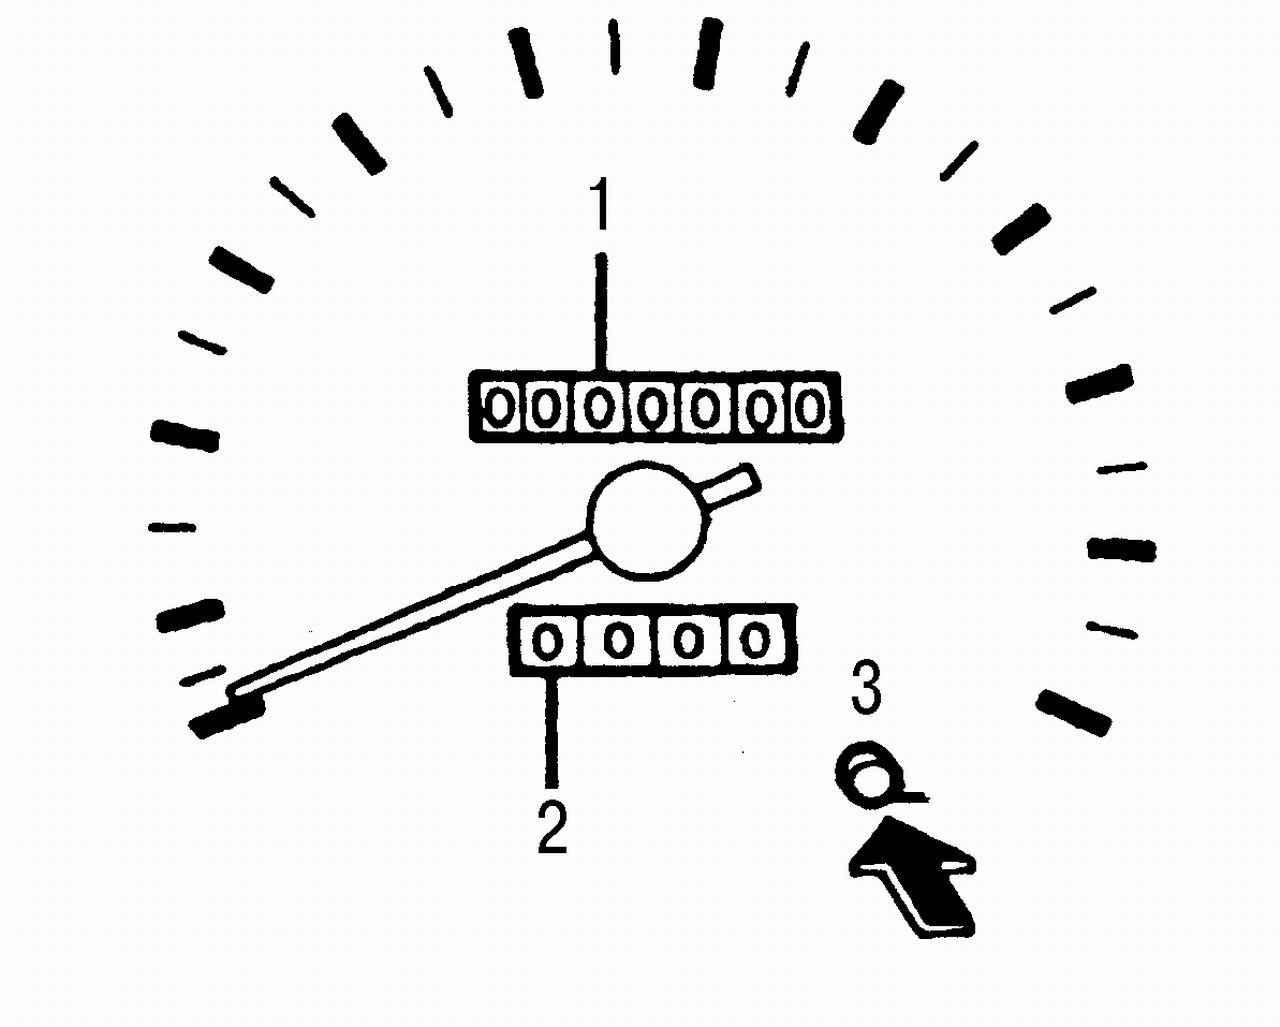 Приборы на панели (датчики) Ниссан Альмера - Nissan Almera ...: http://almera-almera.narod.ru/sostav/3-3l.html